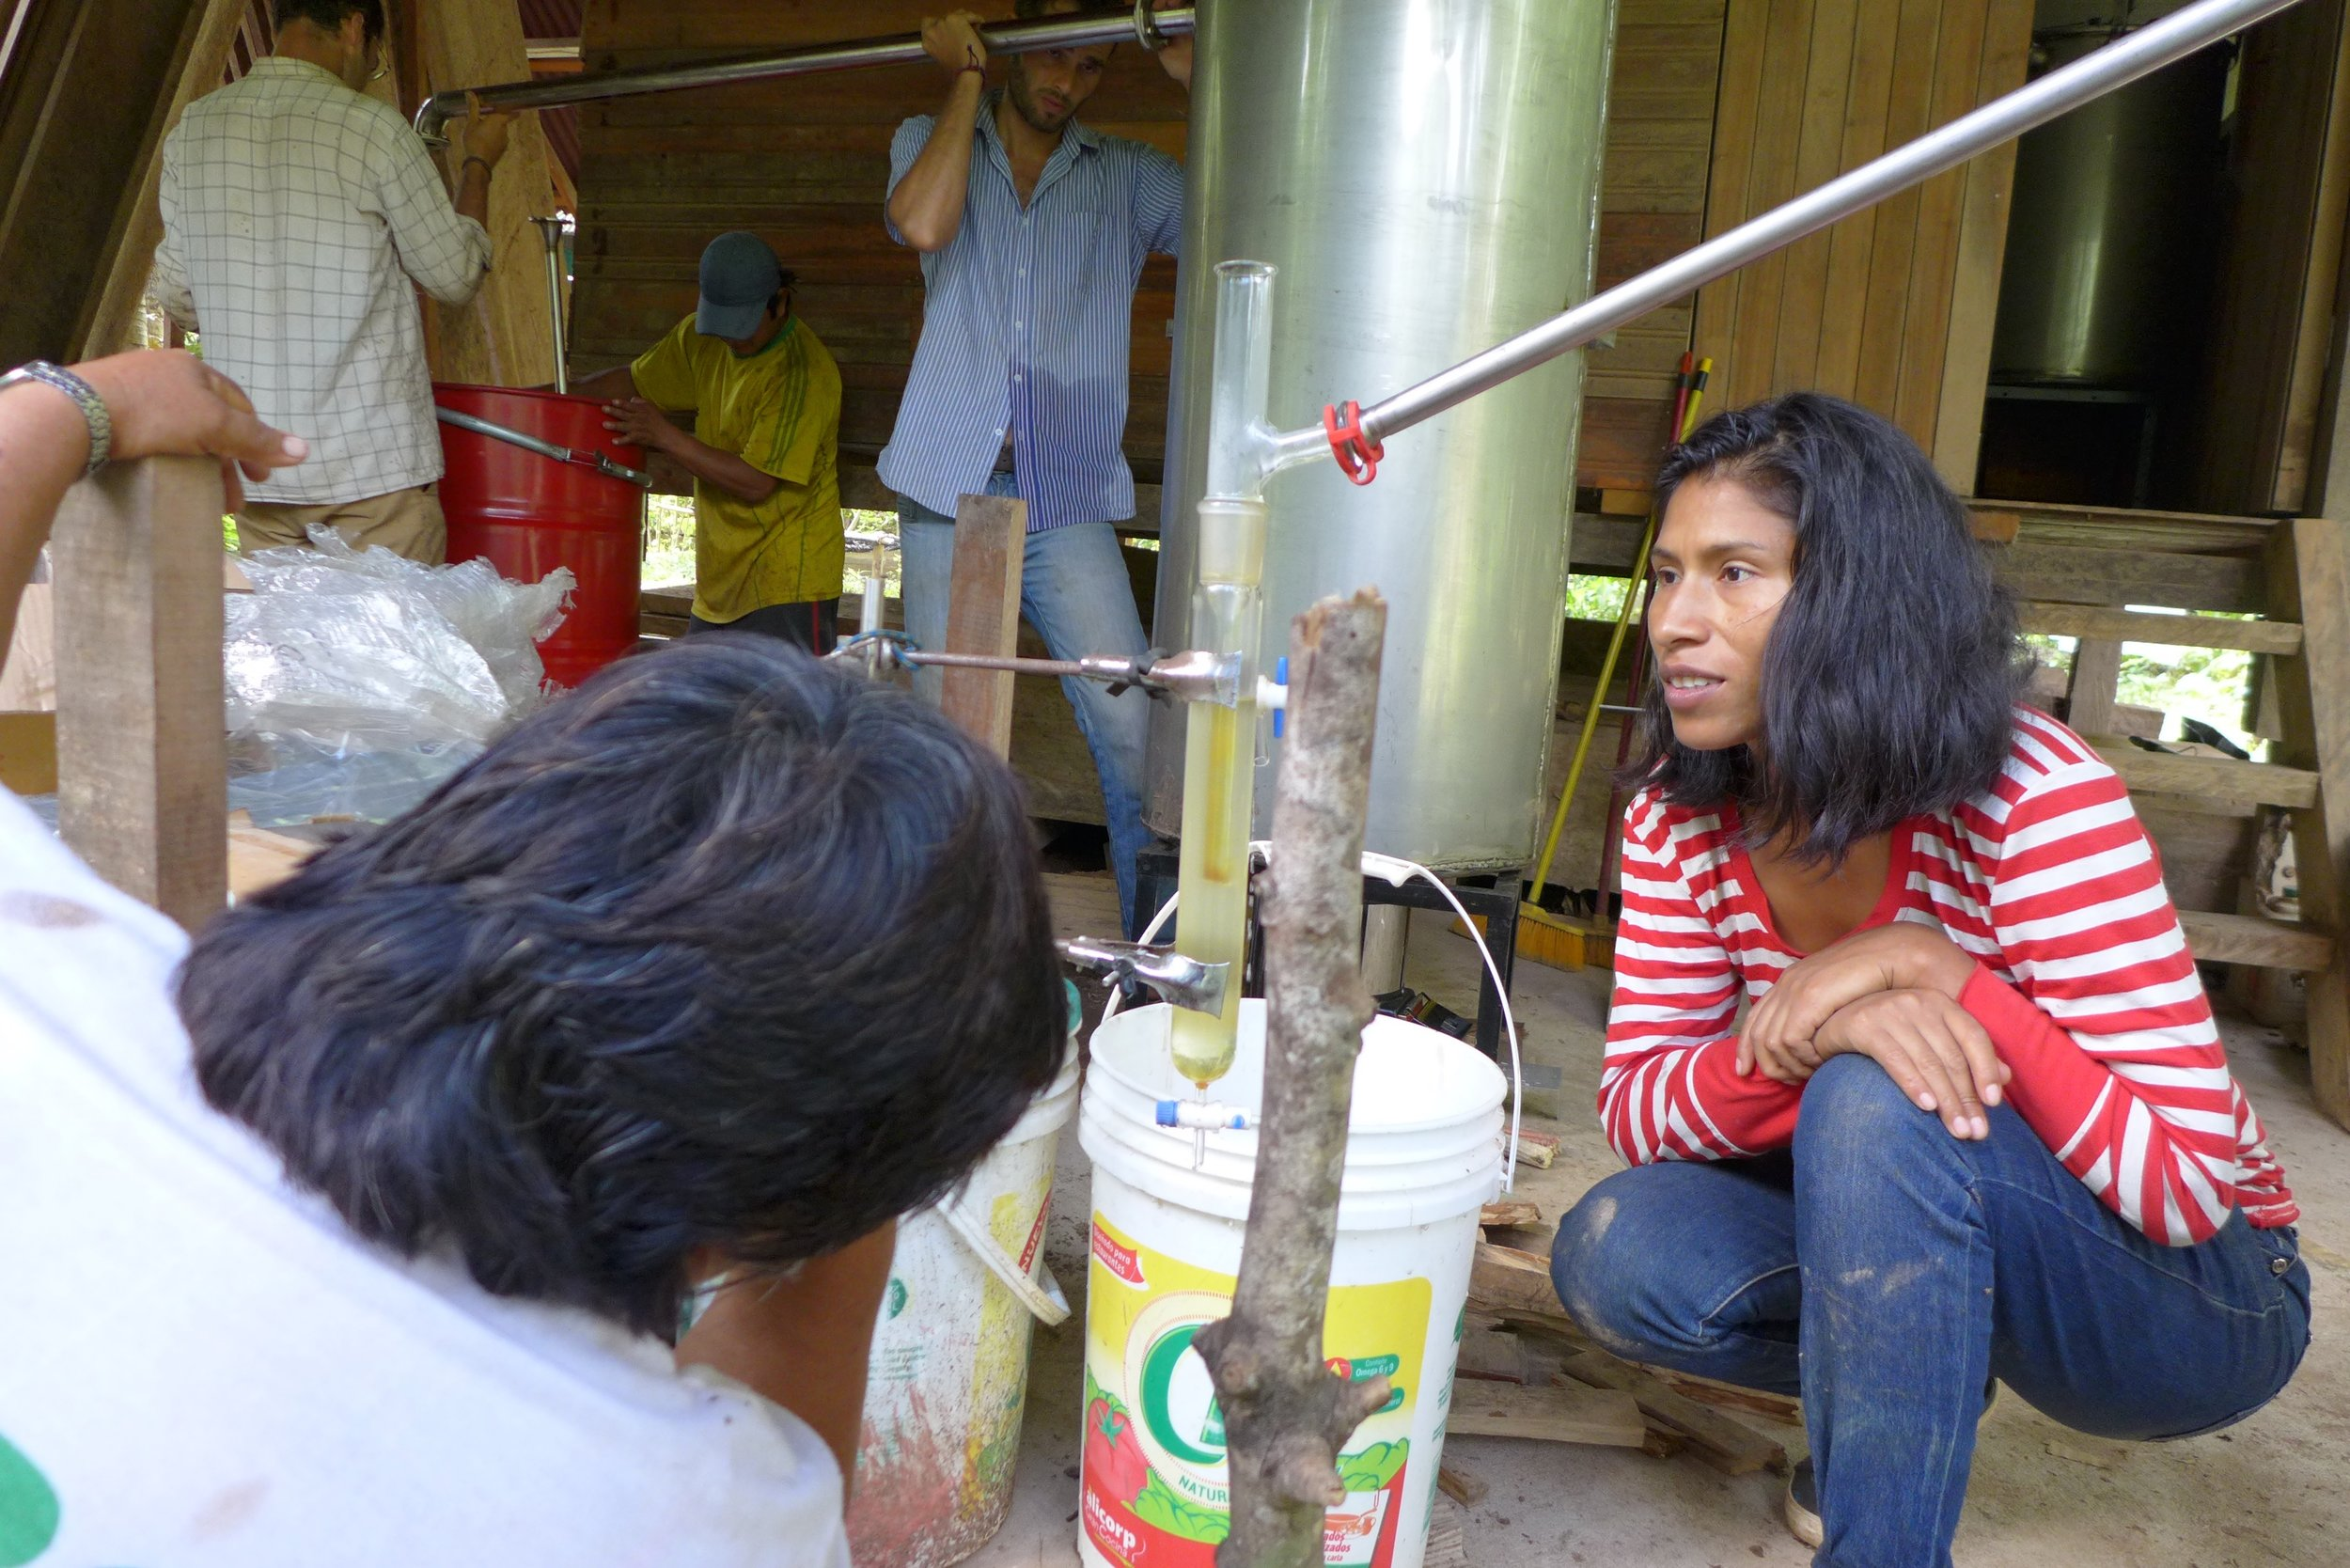 Distilling essential oil